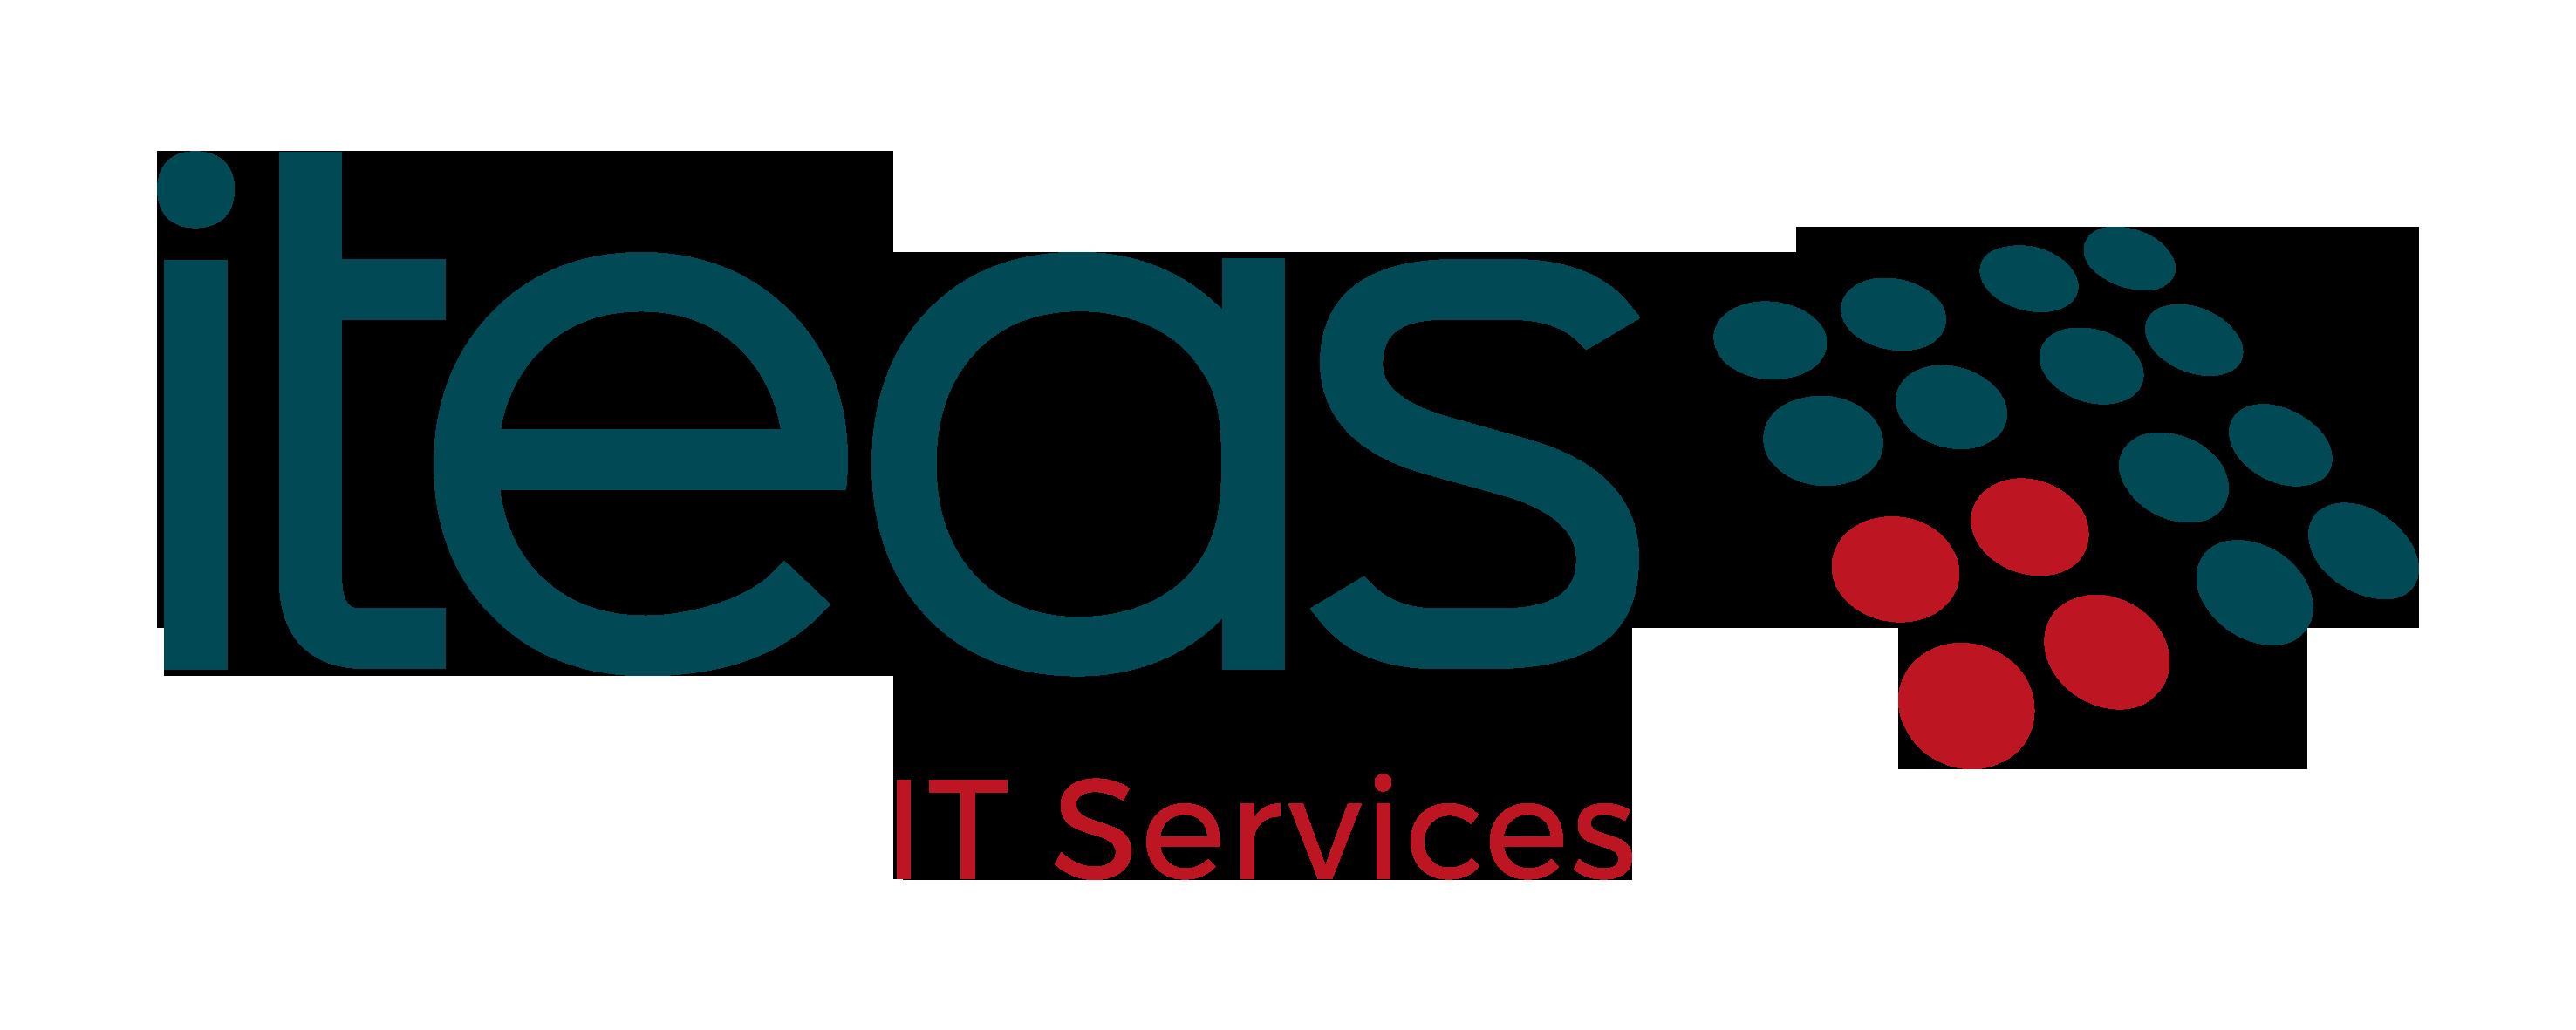 Iteas IT Services Logo